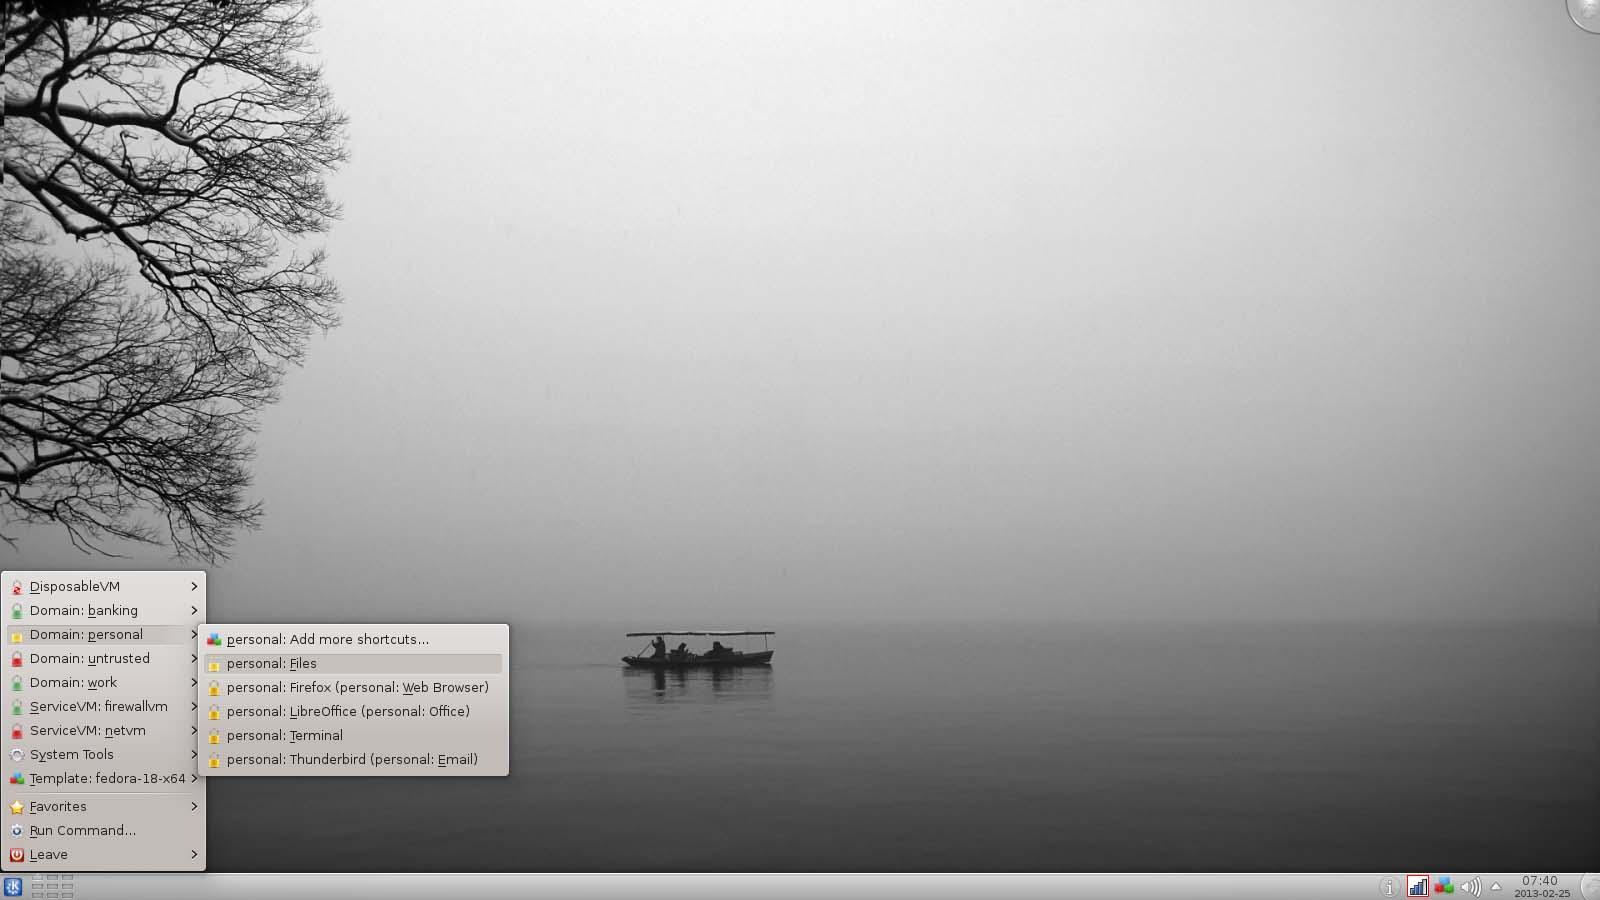 Qube OS distribuciones de linux